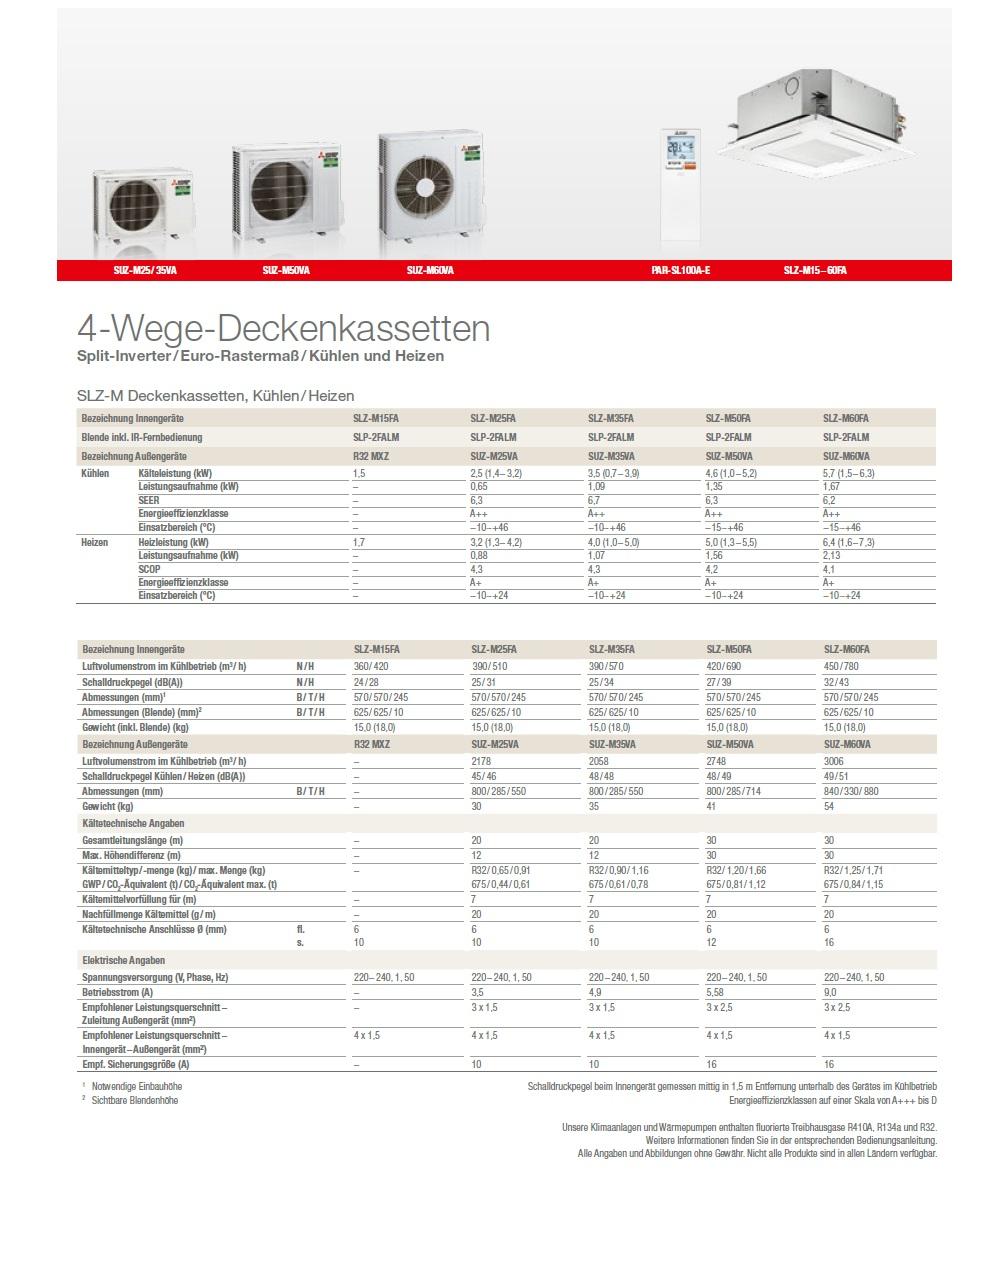 Klimaanlagen Mitsubishi Mono Split 9 Btu Kassettengerät SLZ-M